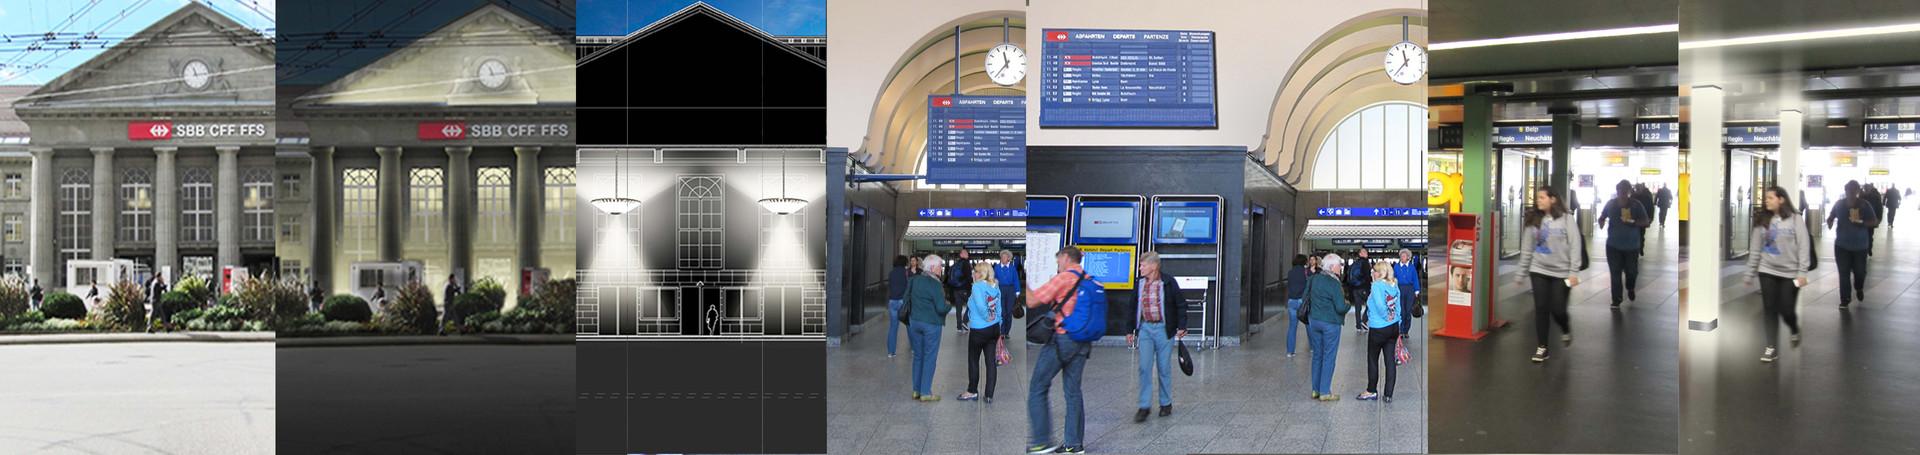 biel station.jpg